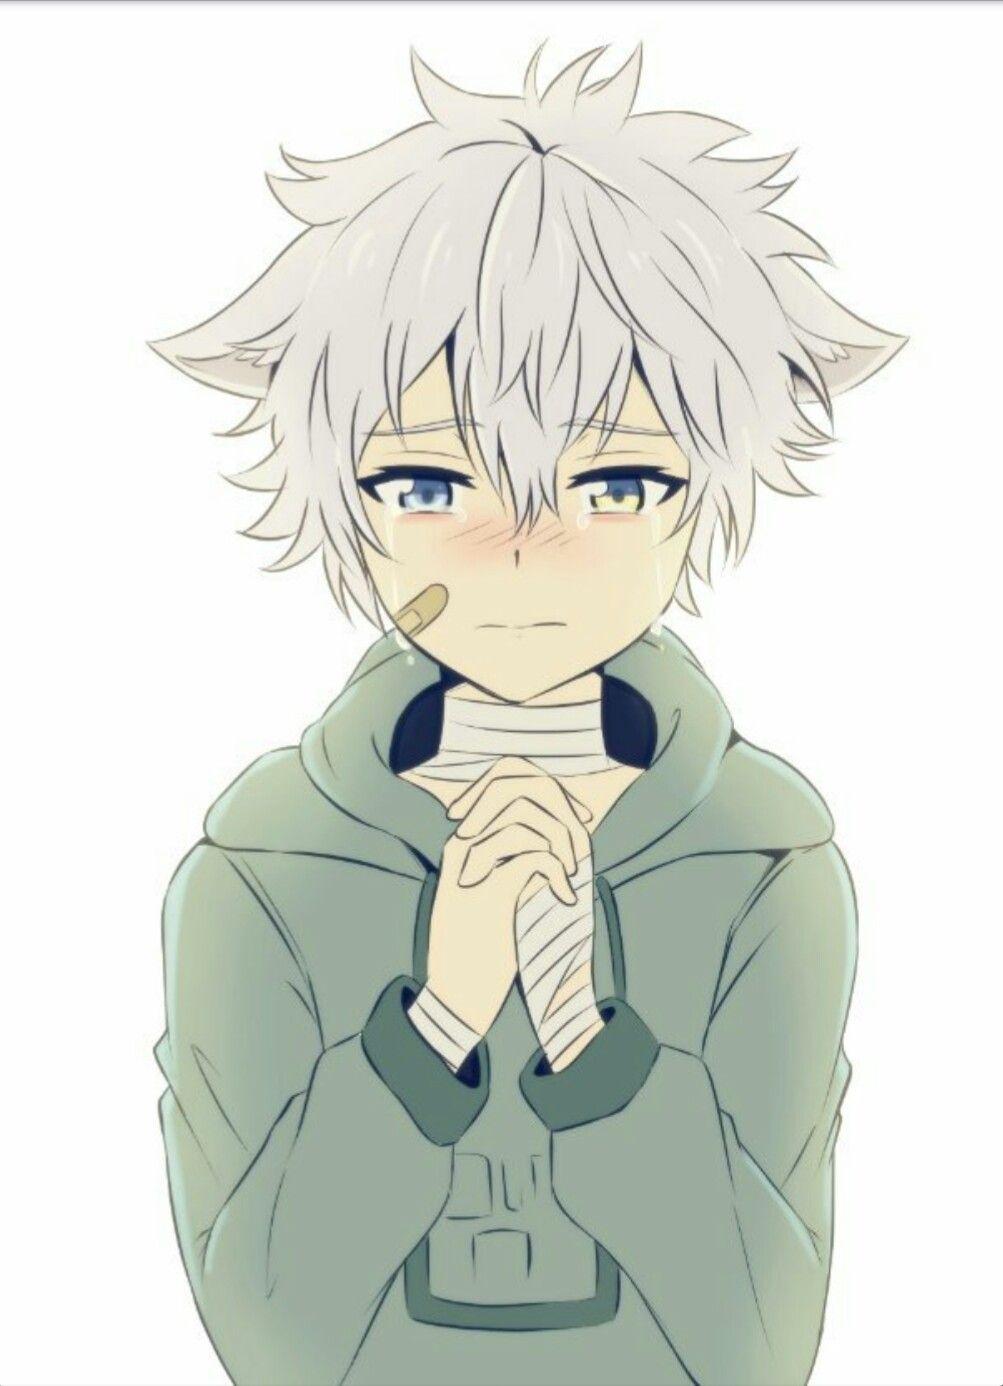 Photo of Lumineeee. Ohmigashhhh it's Mah cute lil bun. He's pleading to me while I pl…